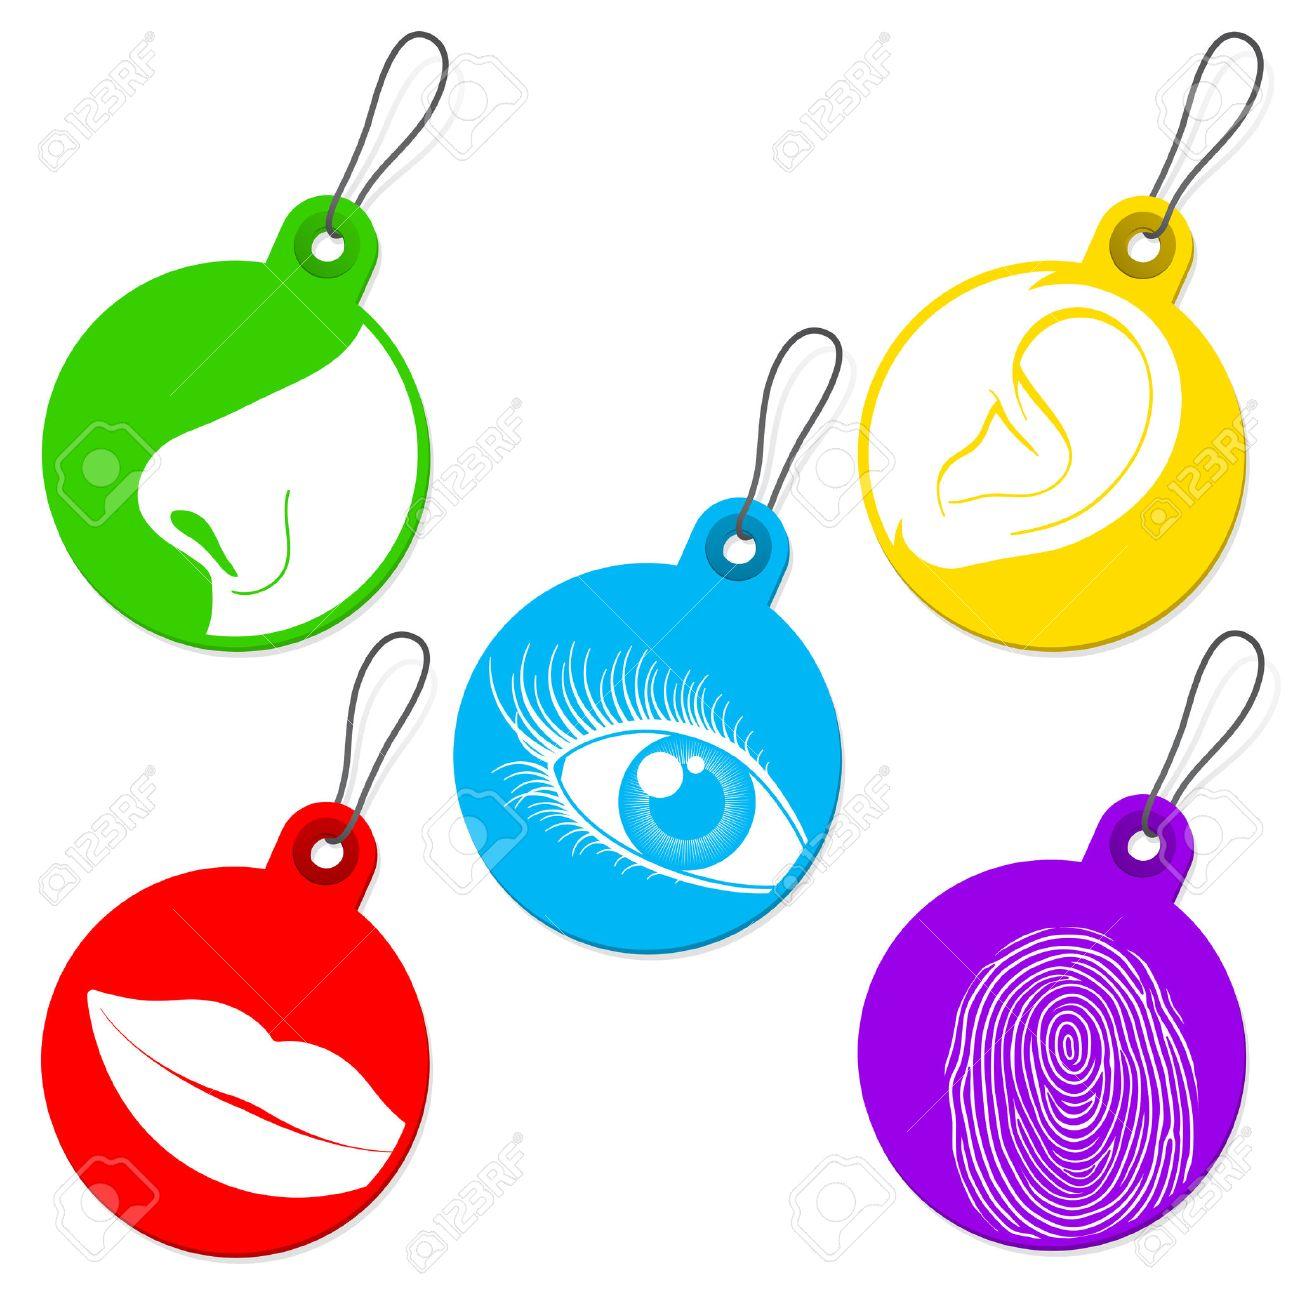 Five Senses Tag Set Royalty Free Cliparts, Vectors, And Stock ...